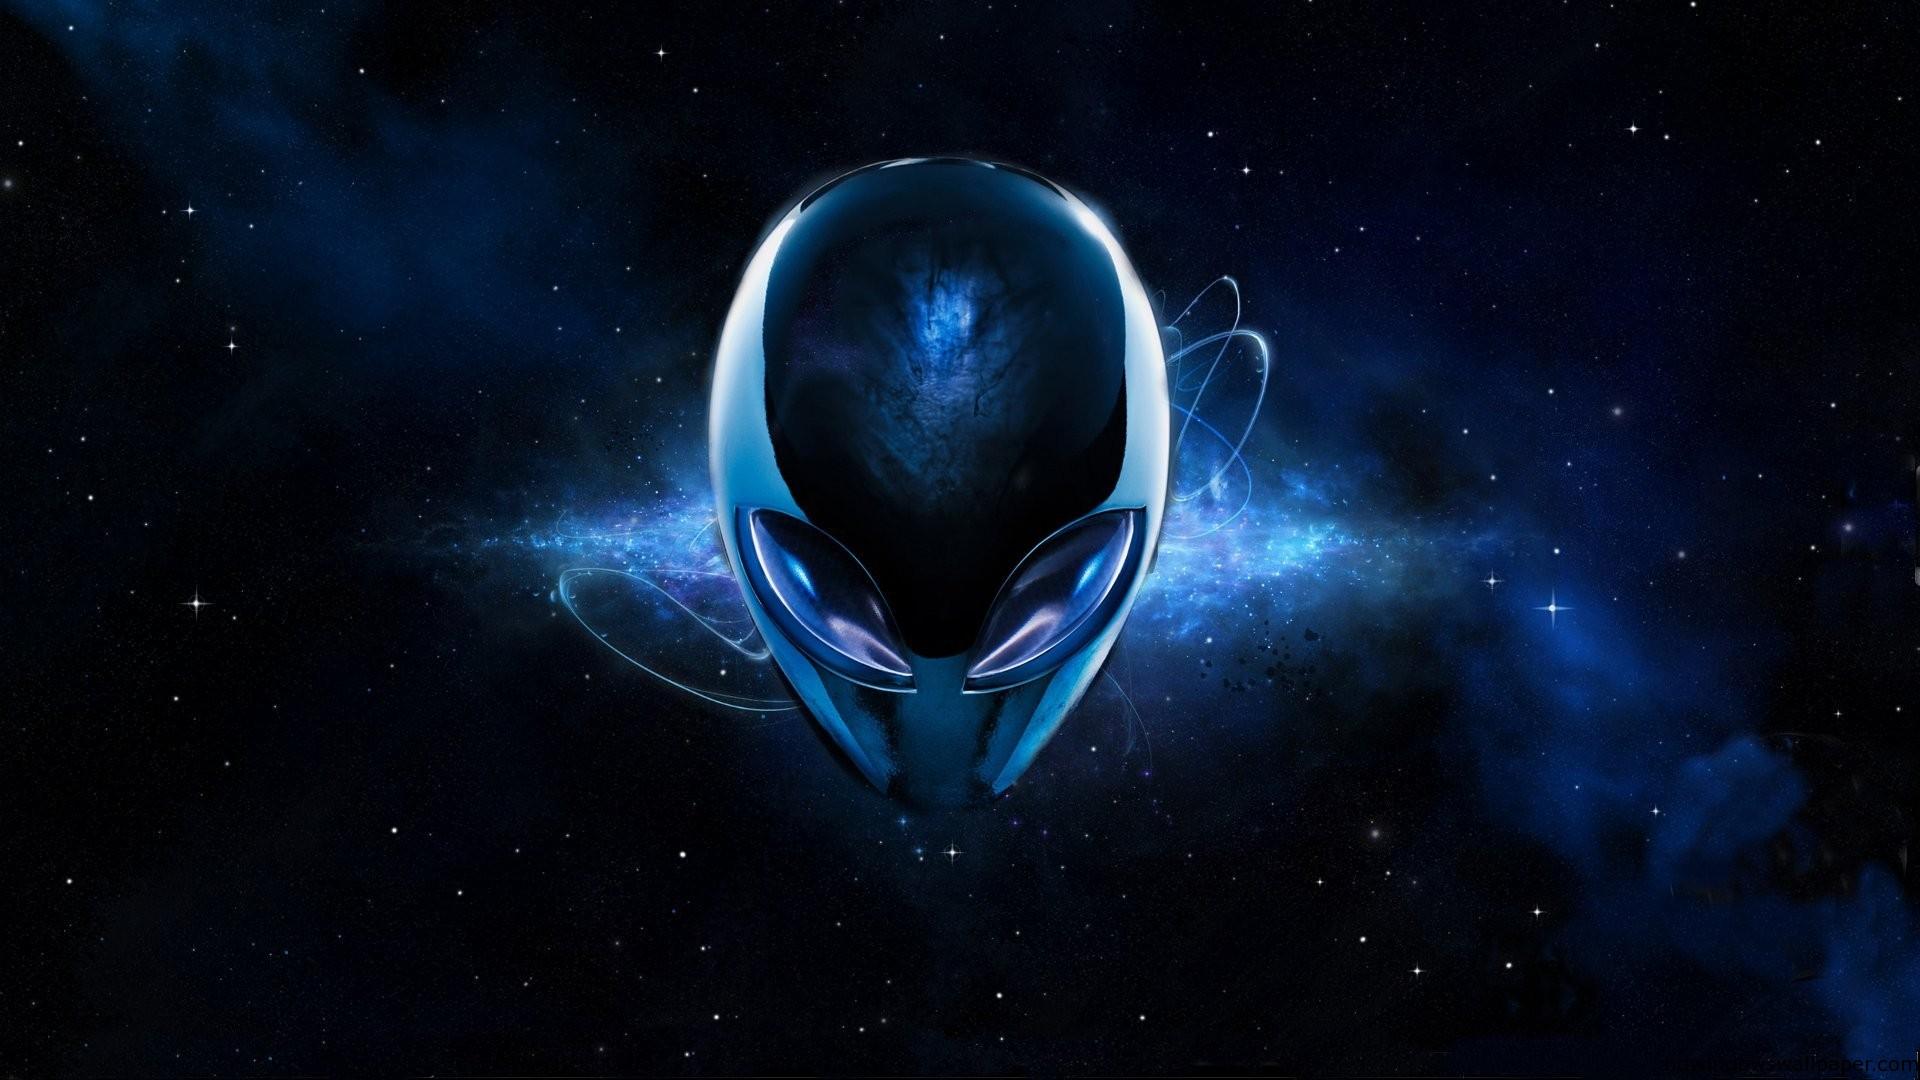 Ufo extraterrestrials piratebay nude tube